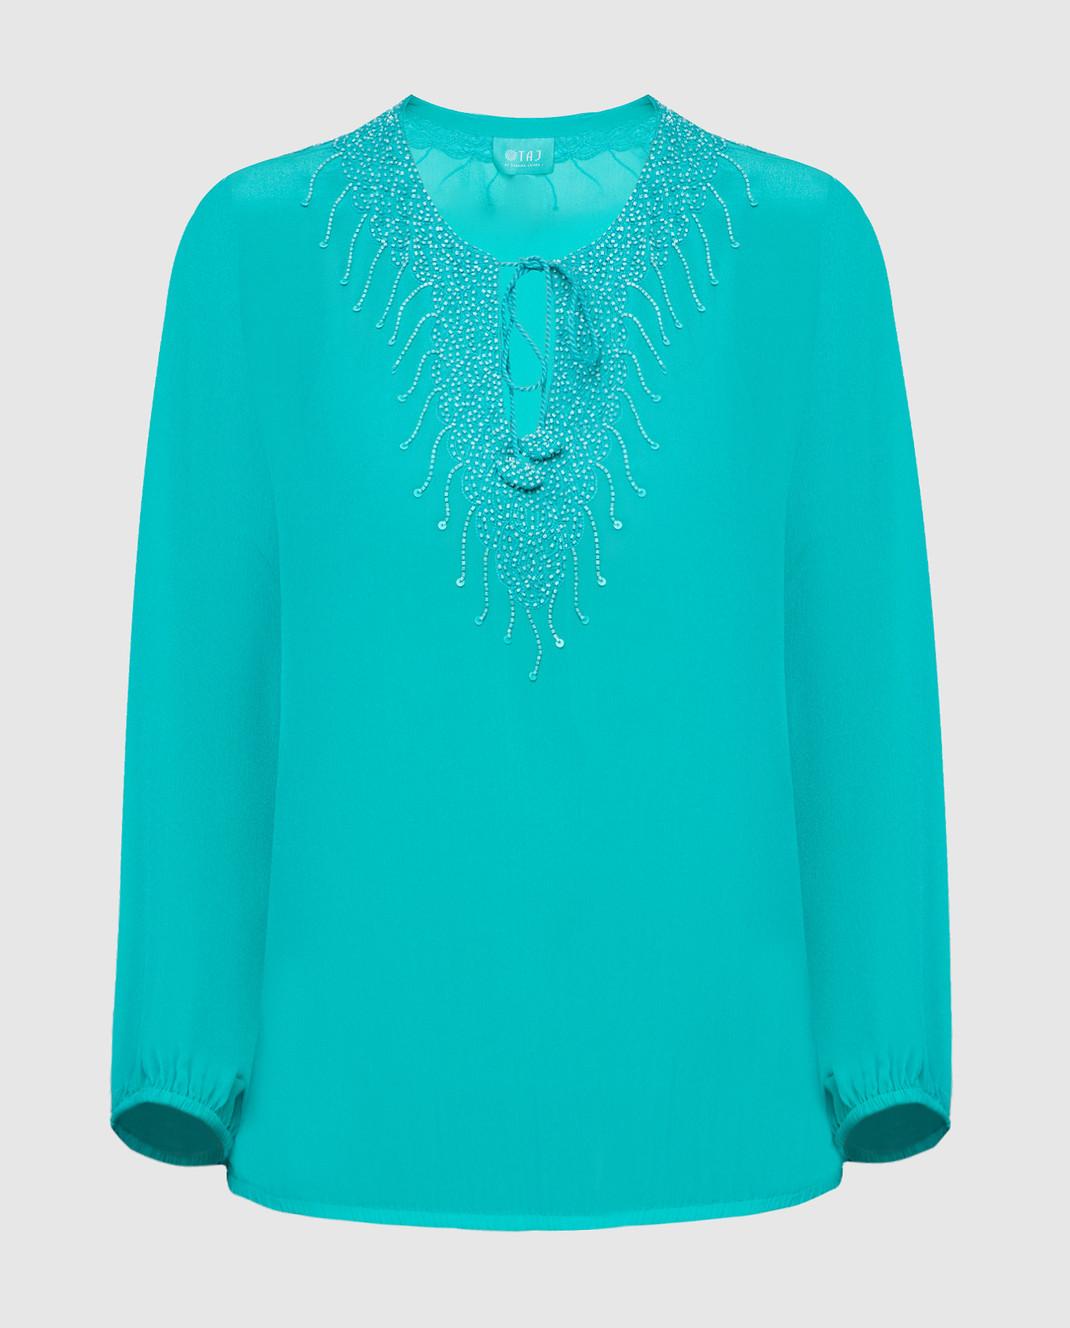 Taj by Sabrina Бирюзовая блуза из шелка SUSH1087